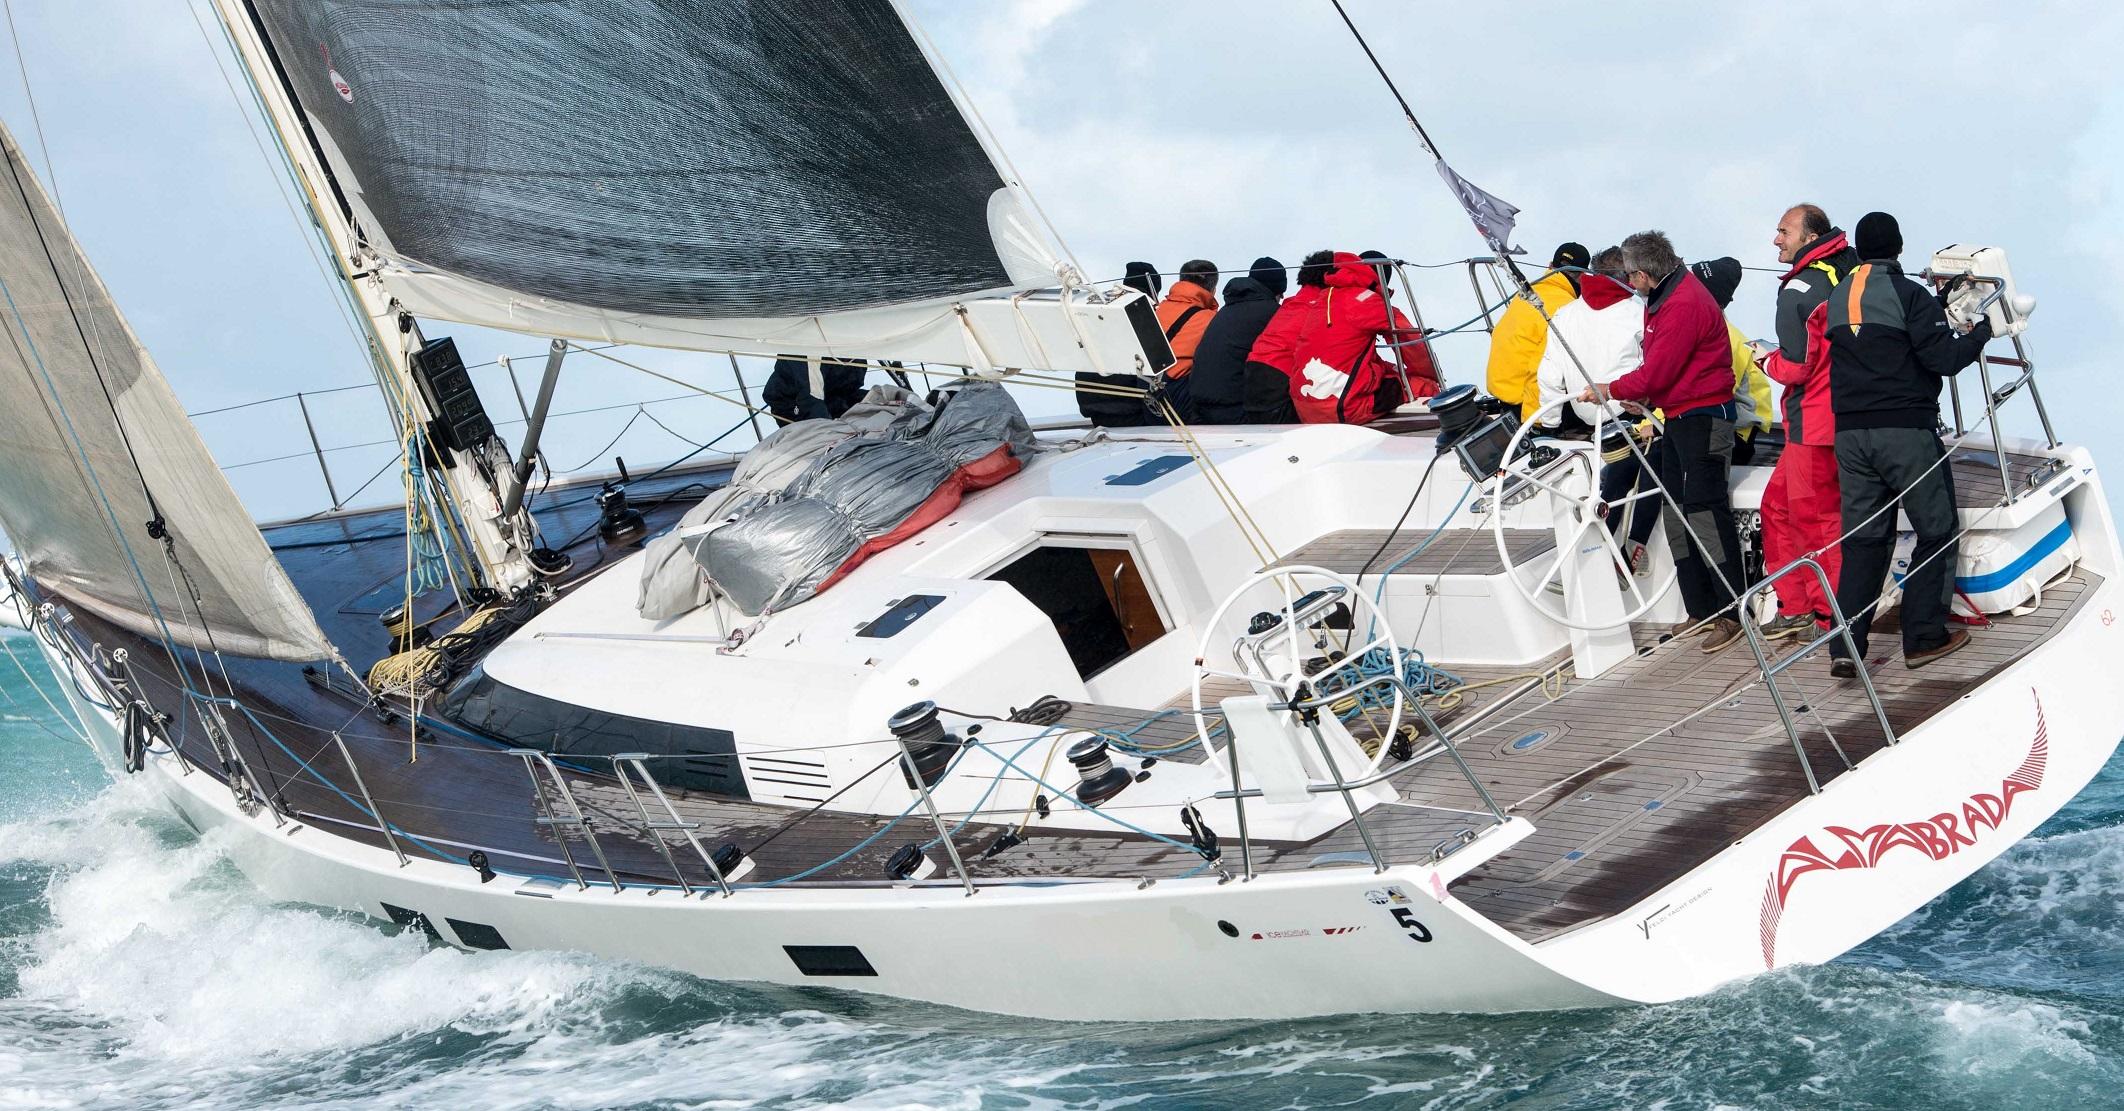 Almabrada under sail